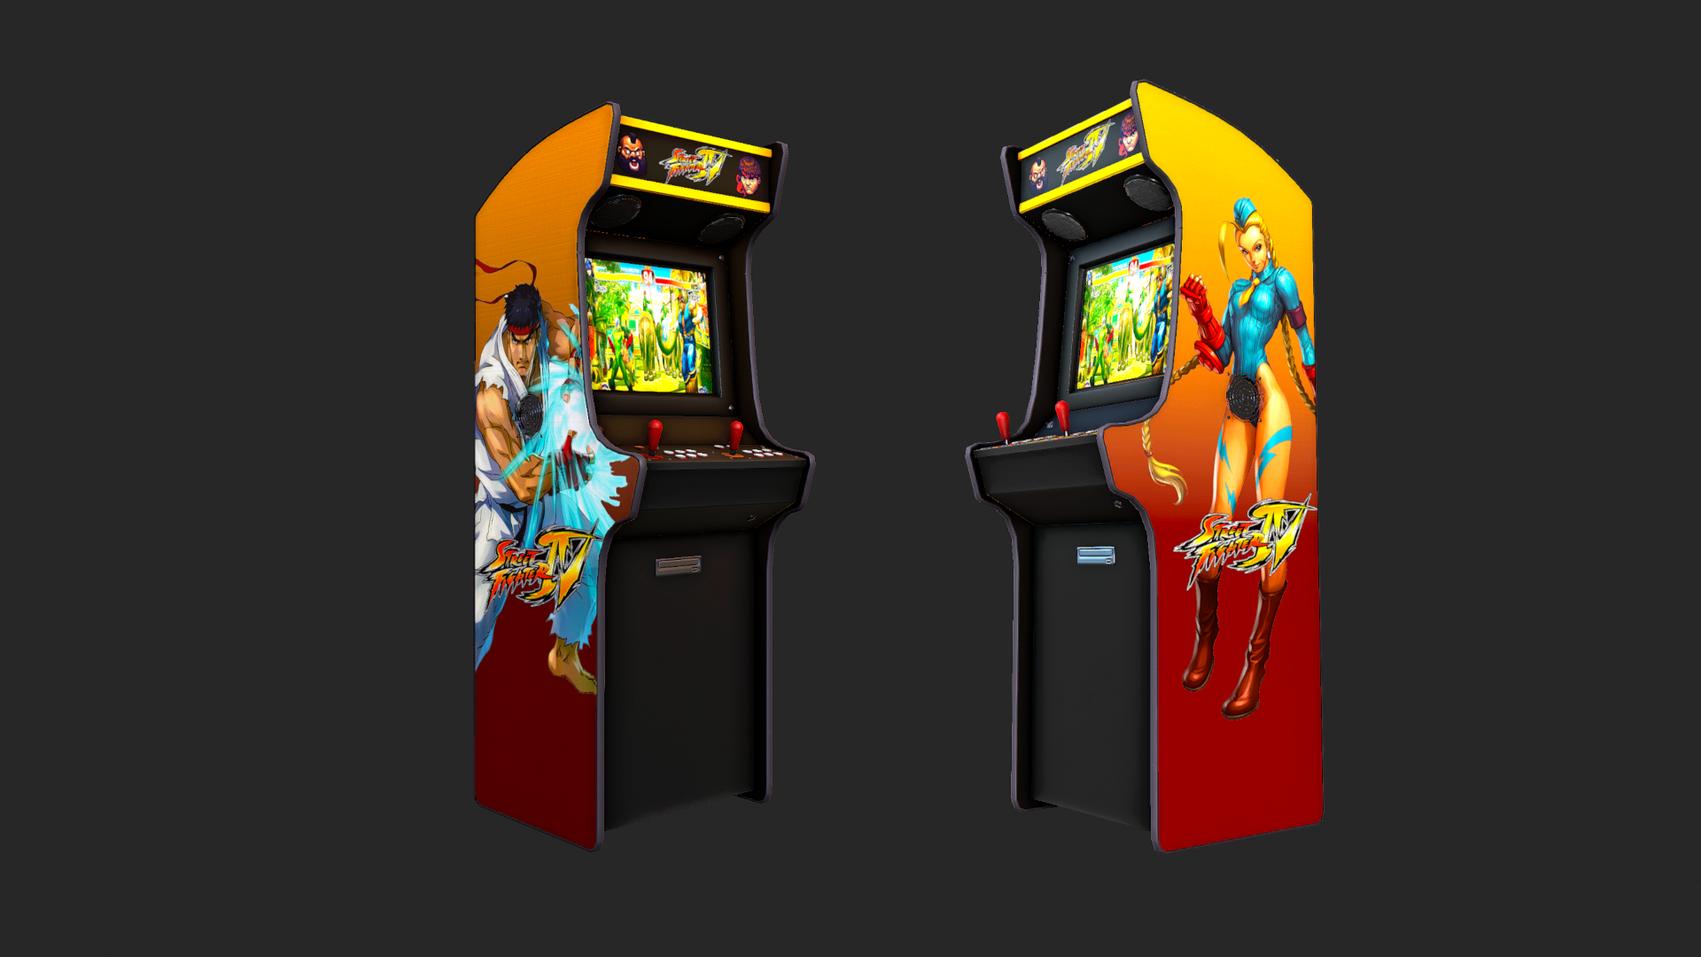 SF4 Arcade Cabinet